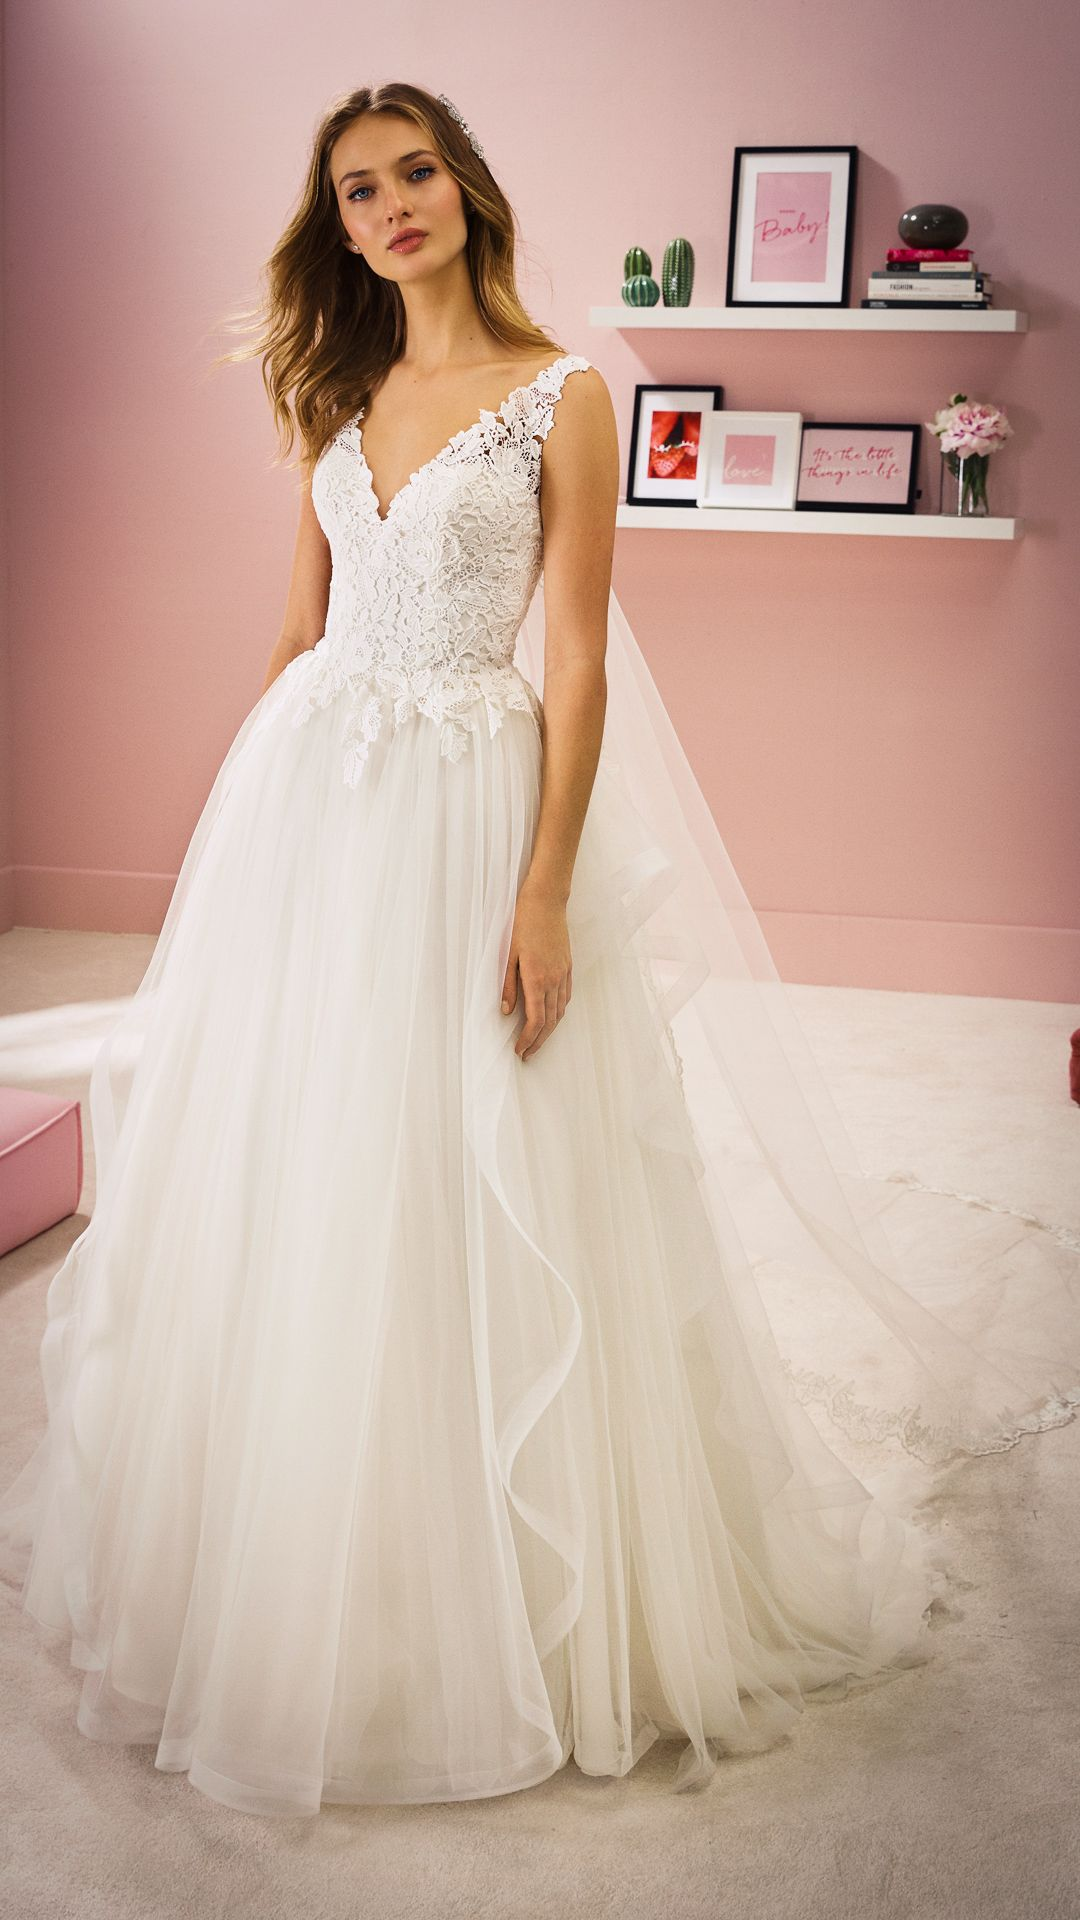 Hochzeitskleider 16 White One Kollektion Modell: ELLA-B